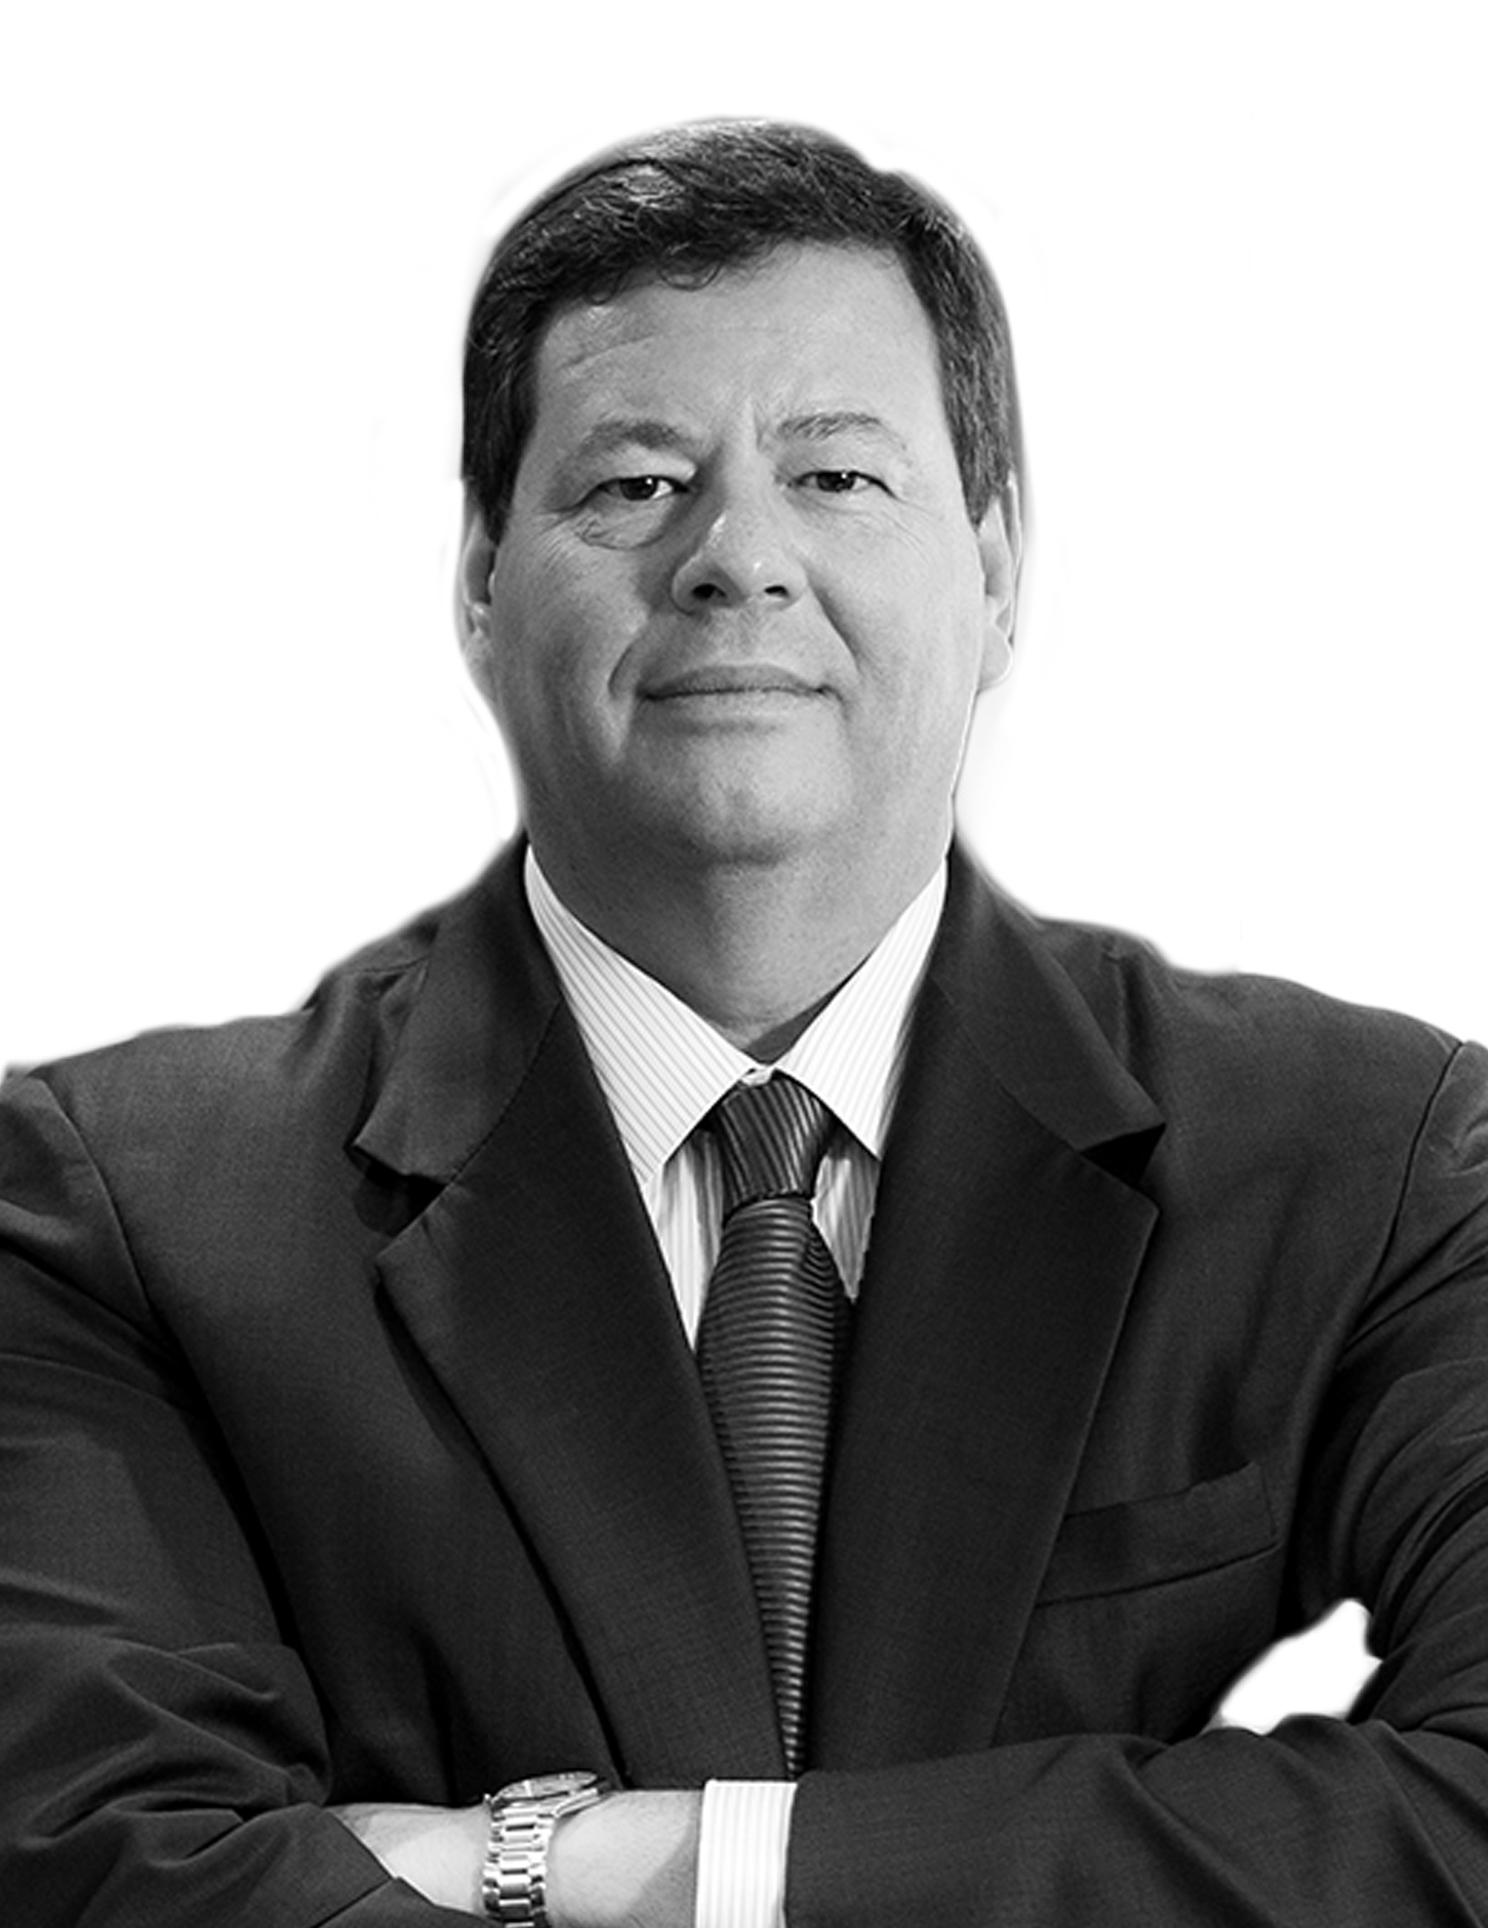 Murilo Cleve Machado